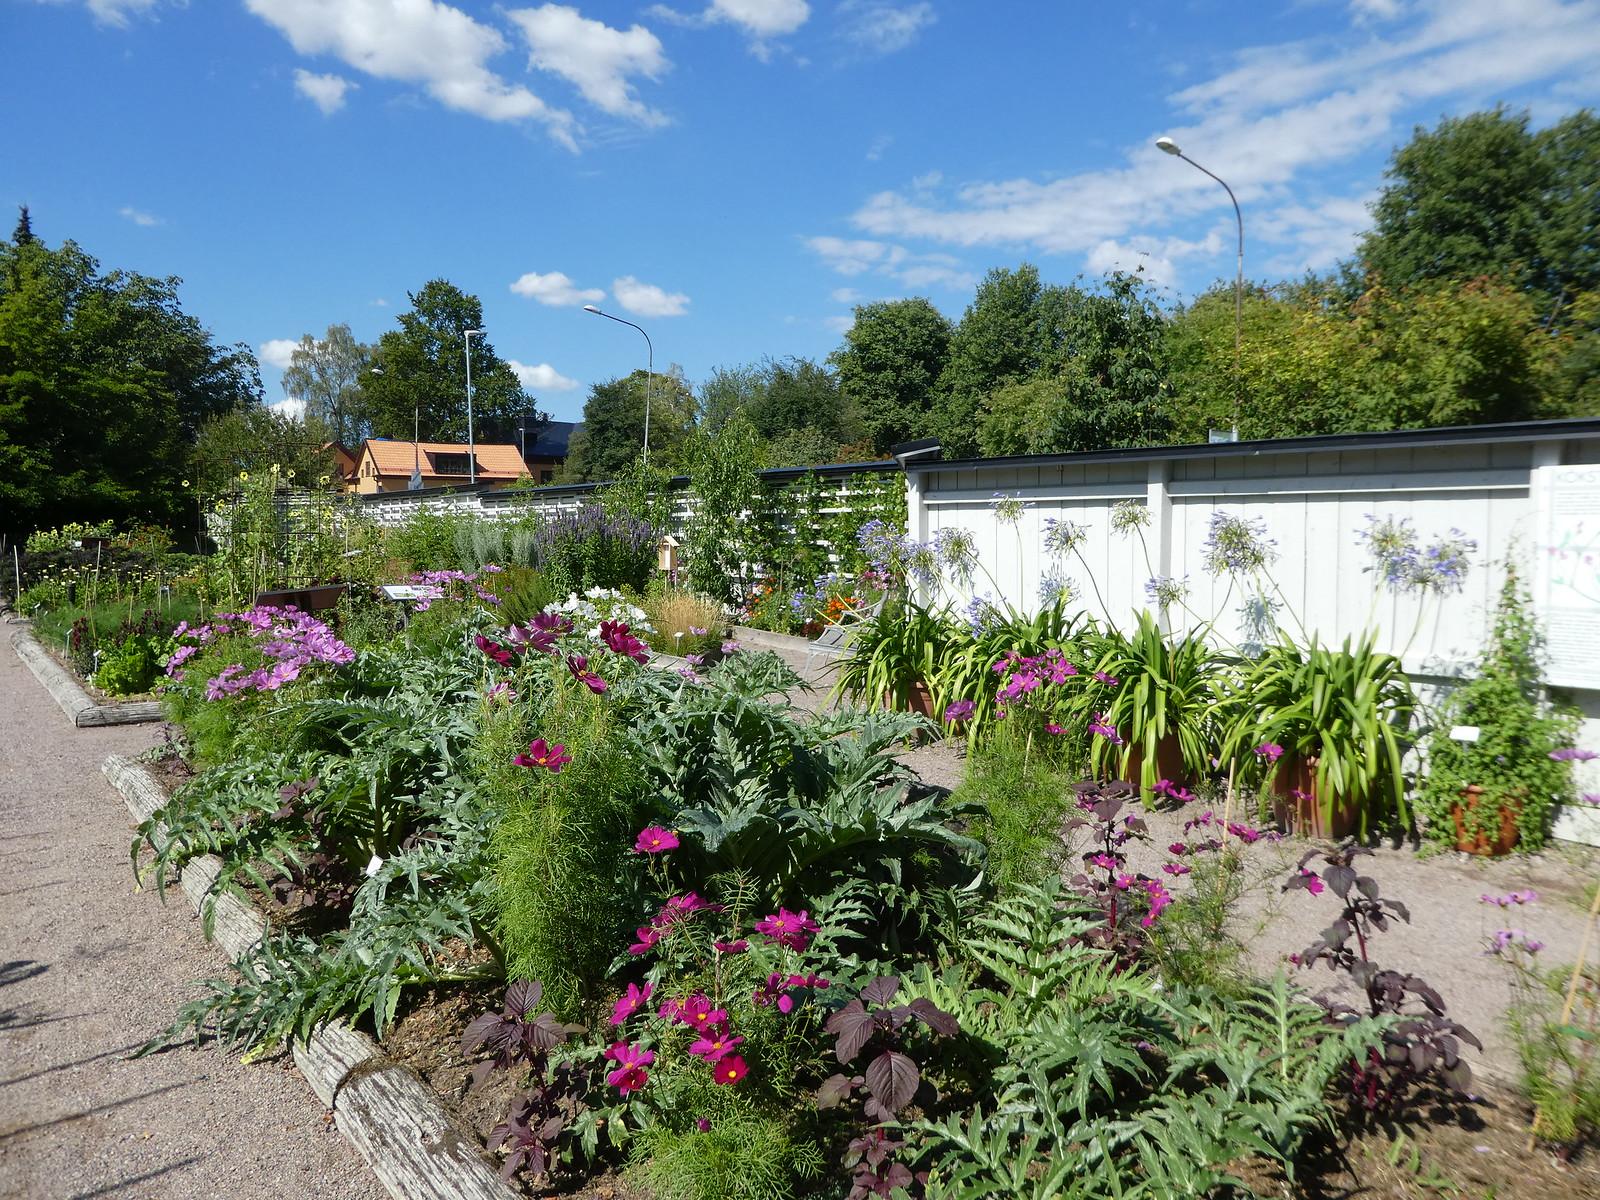 Uppsala Botanical Garden